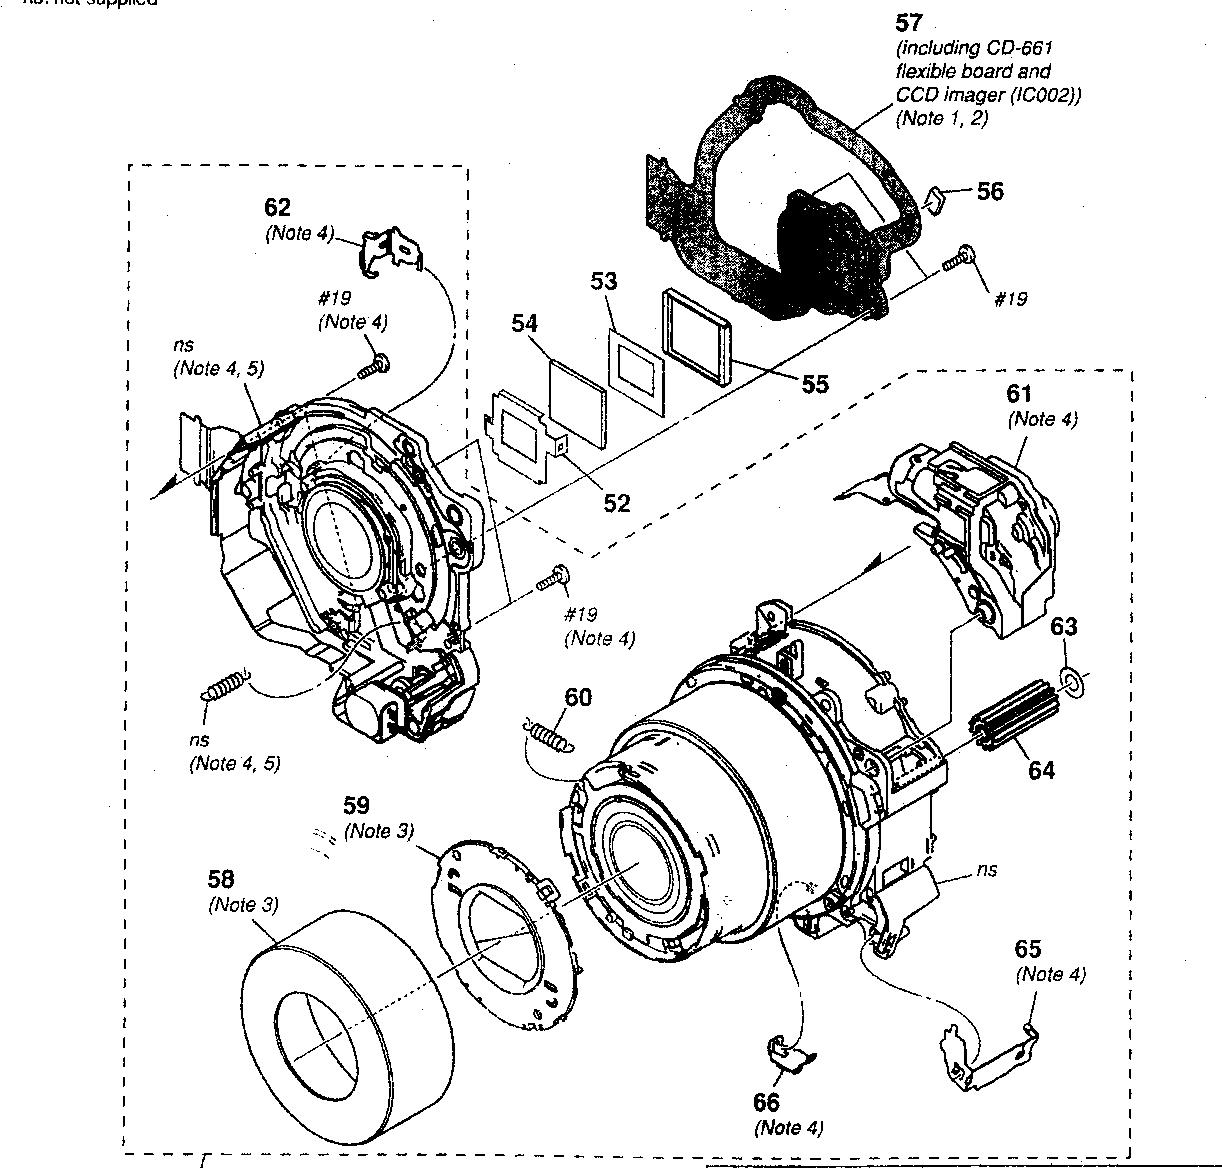 Lens Block Diagram Amp Parts List For Model Dscn2 Sony Parts